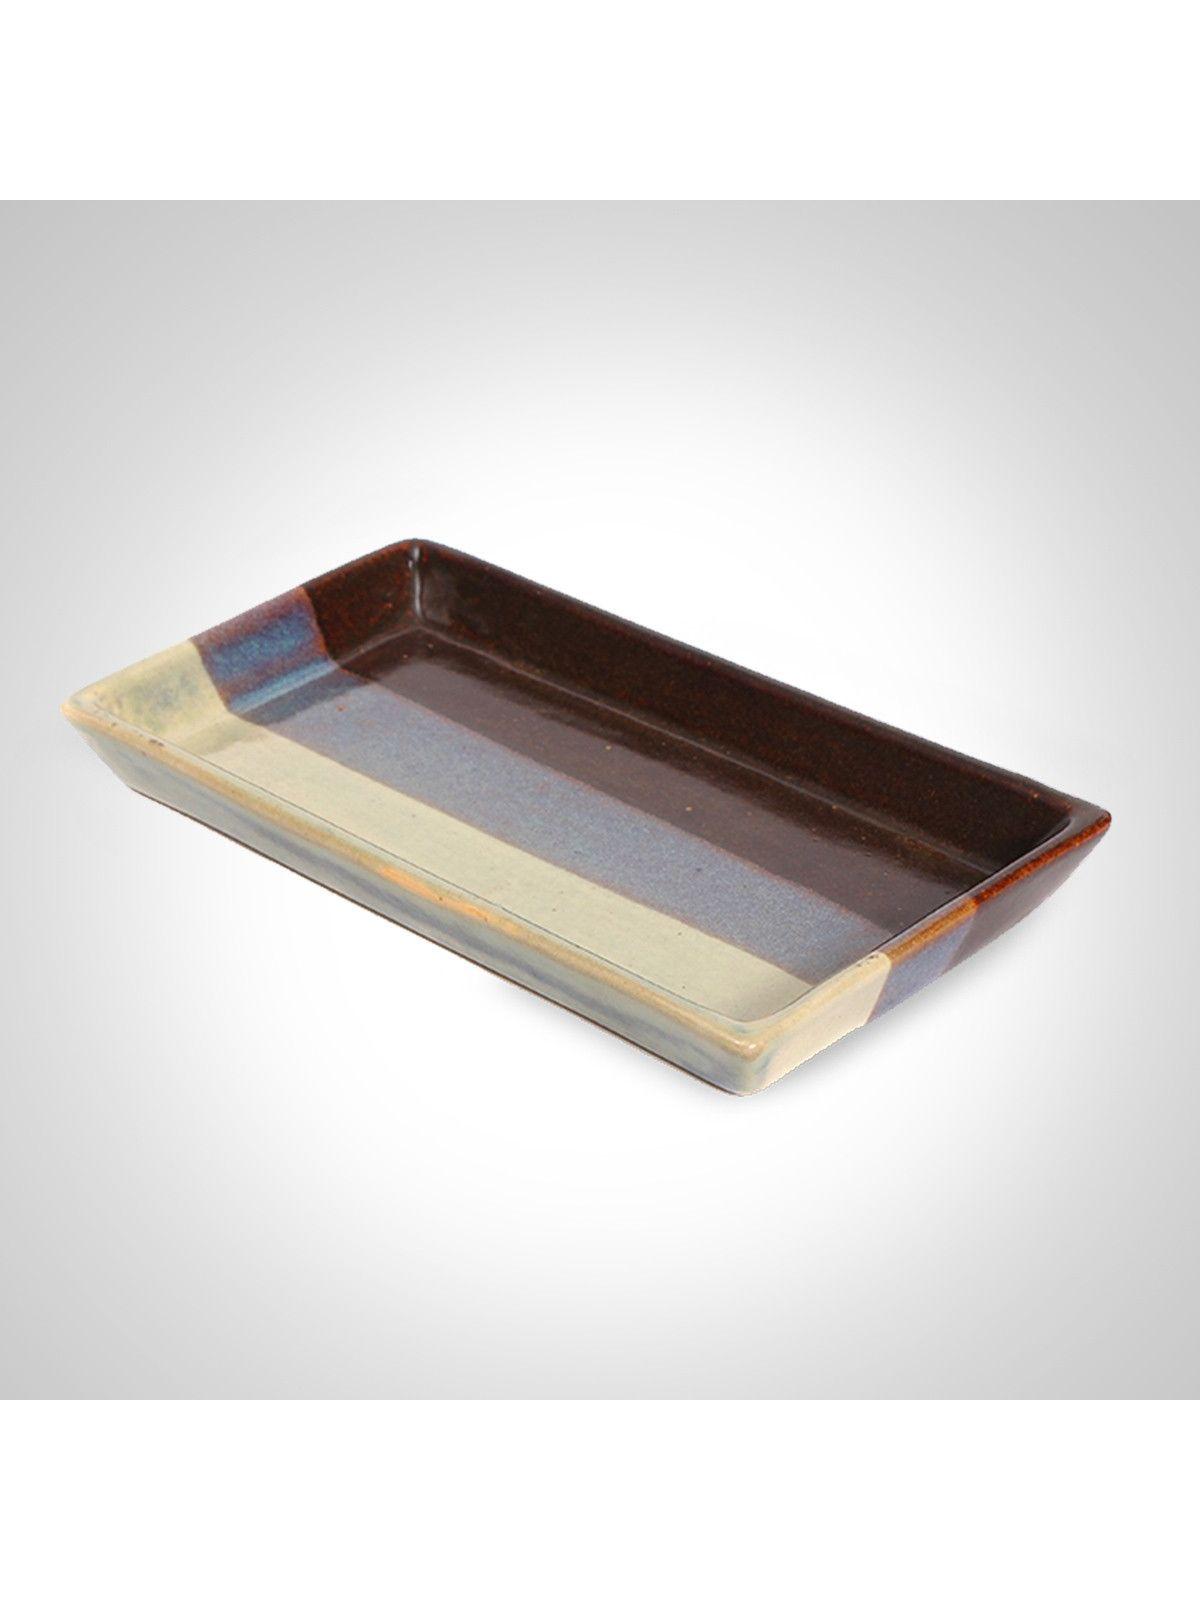 Tri-colored ceramic plate